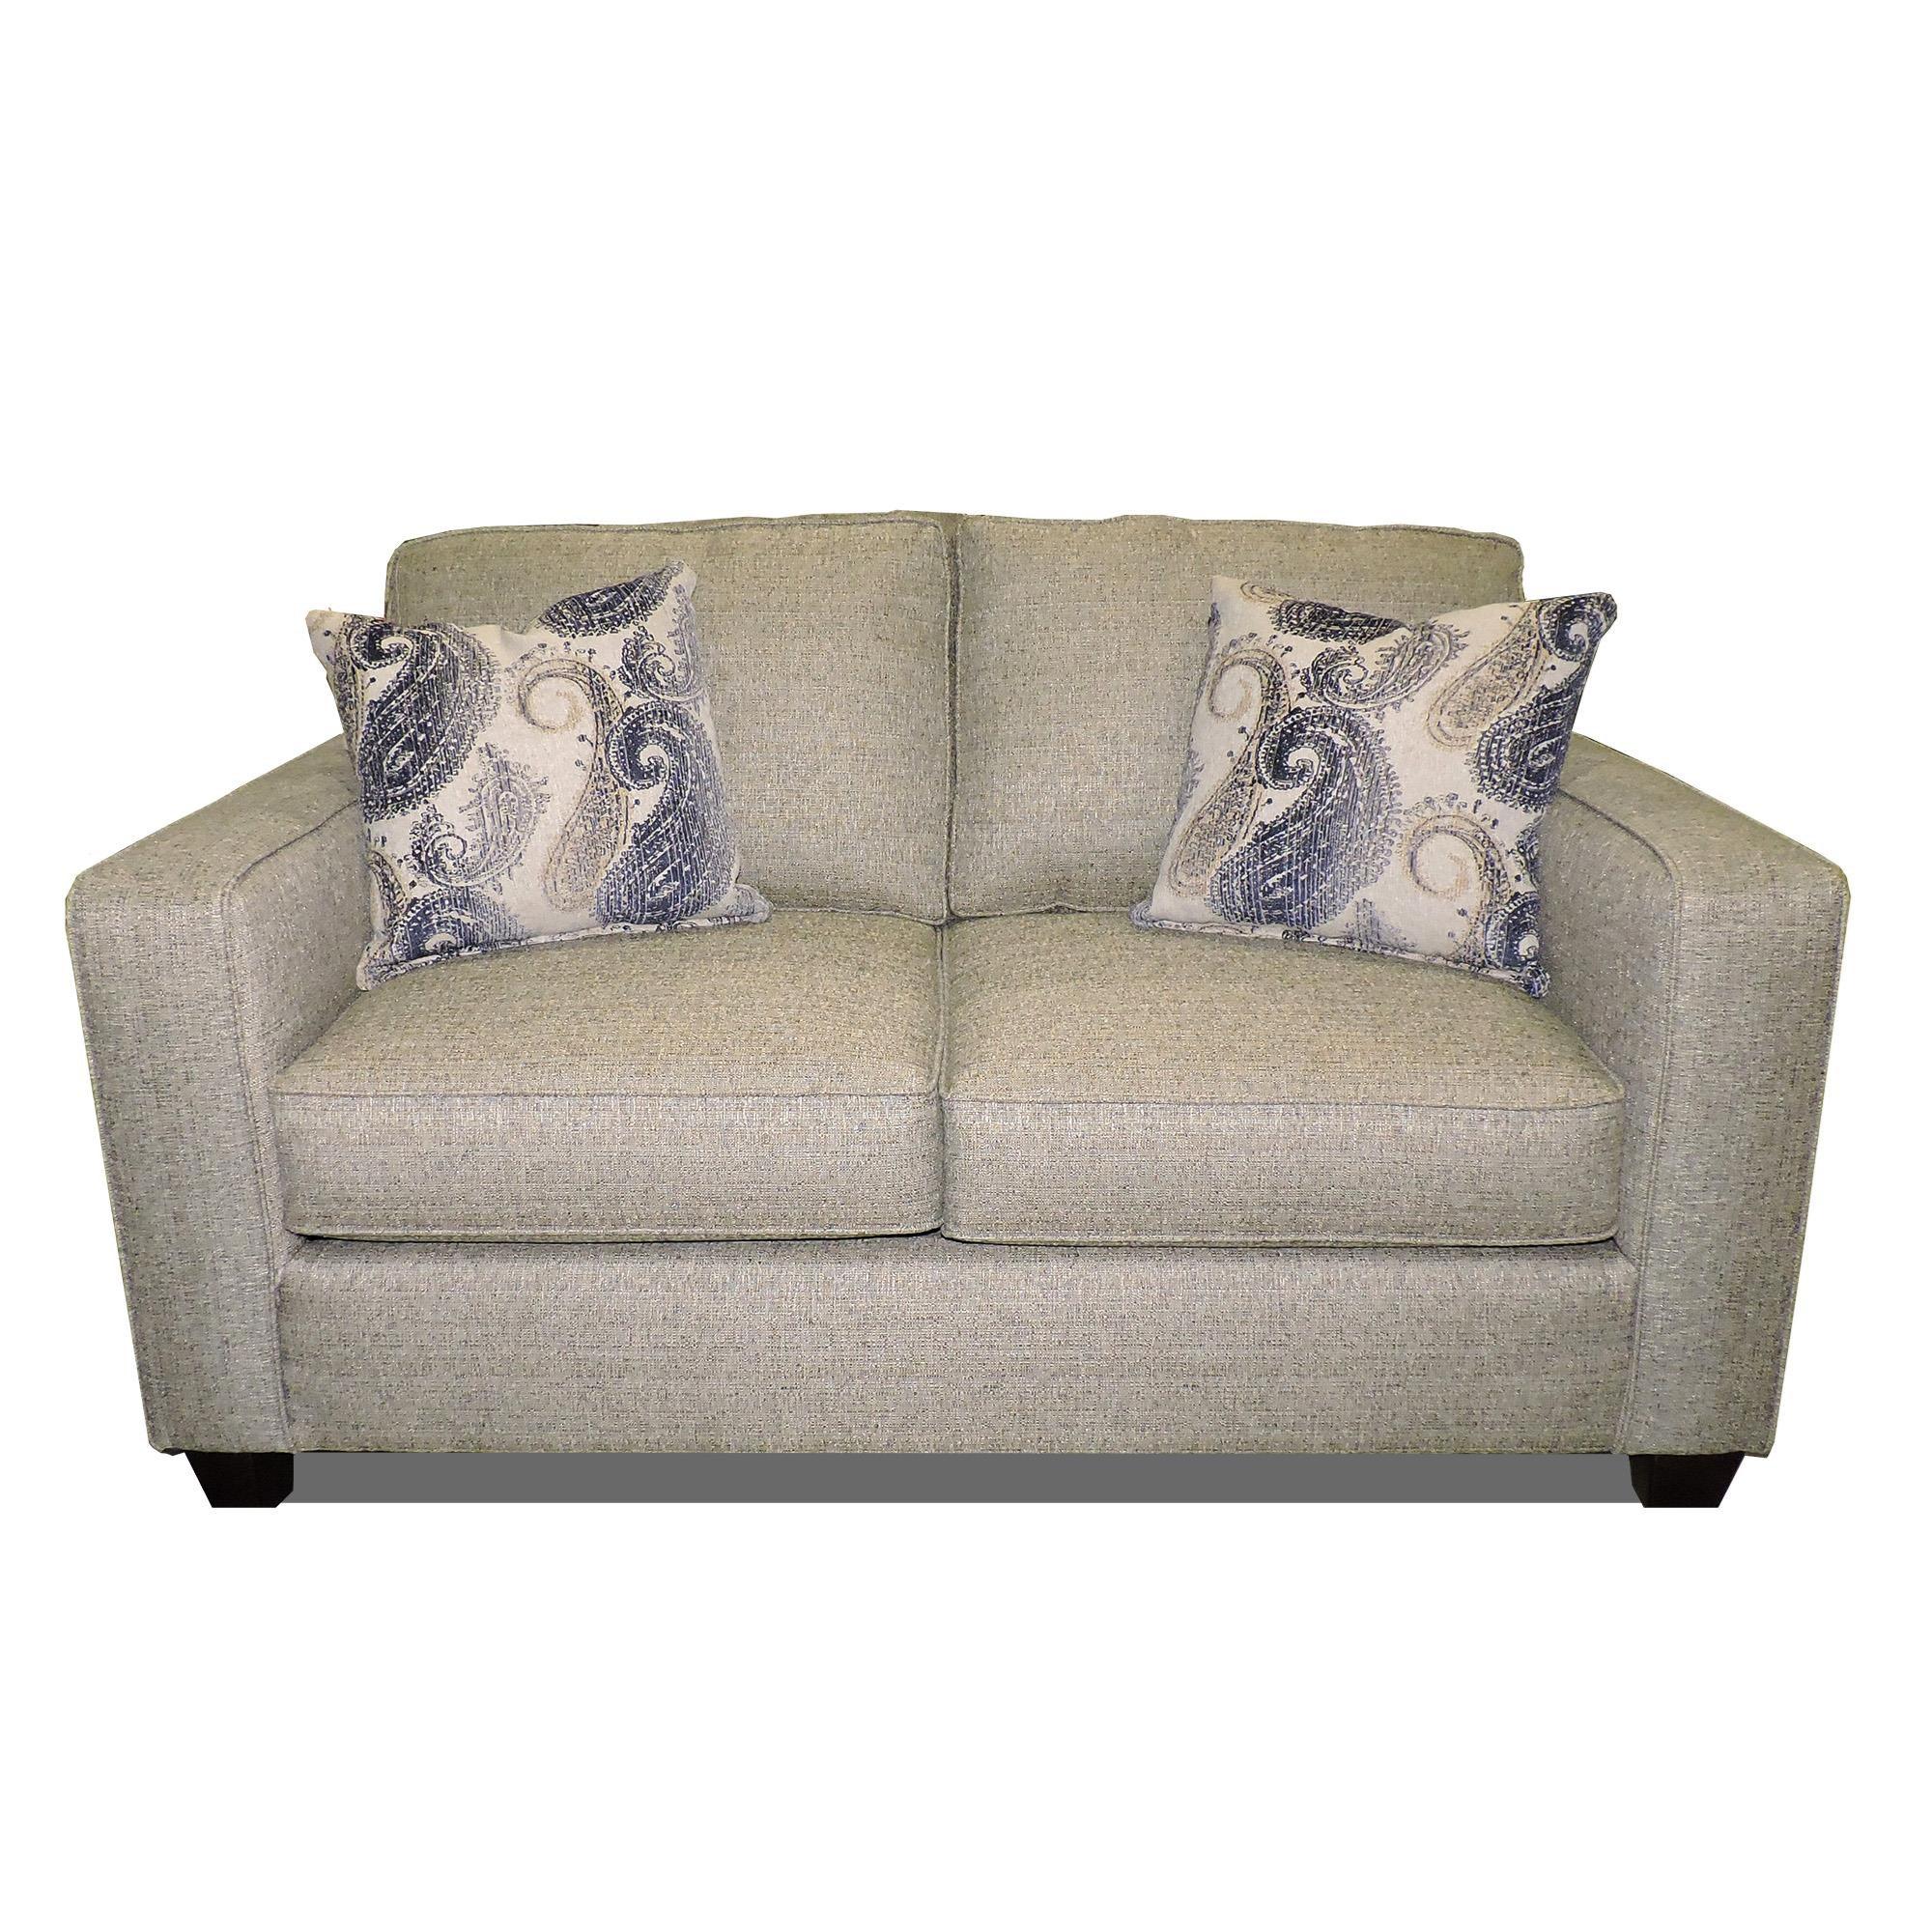 Fusion Furniture 3560 Loveseat - Item Number: 3561Vibrant Smoke